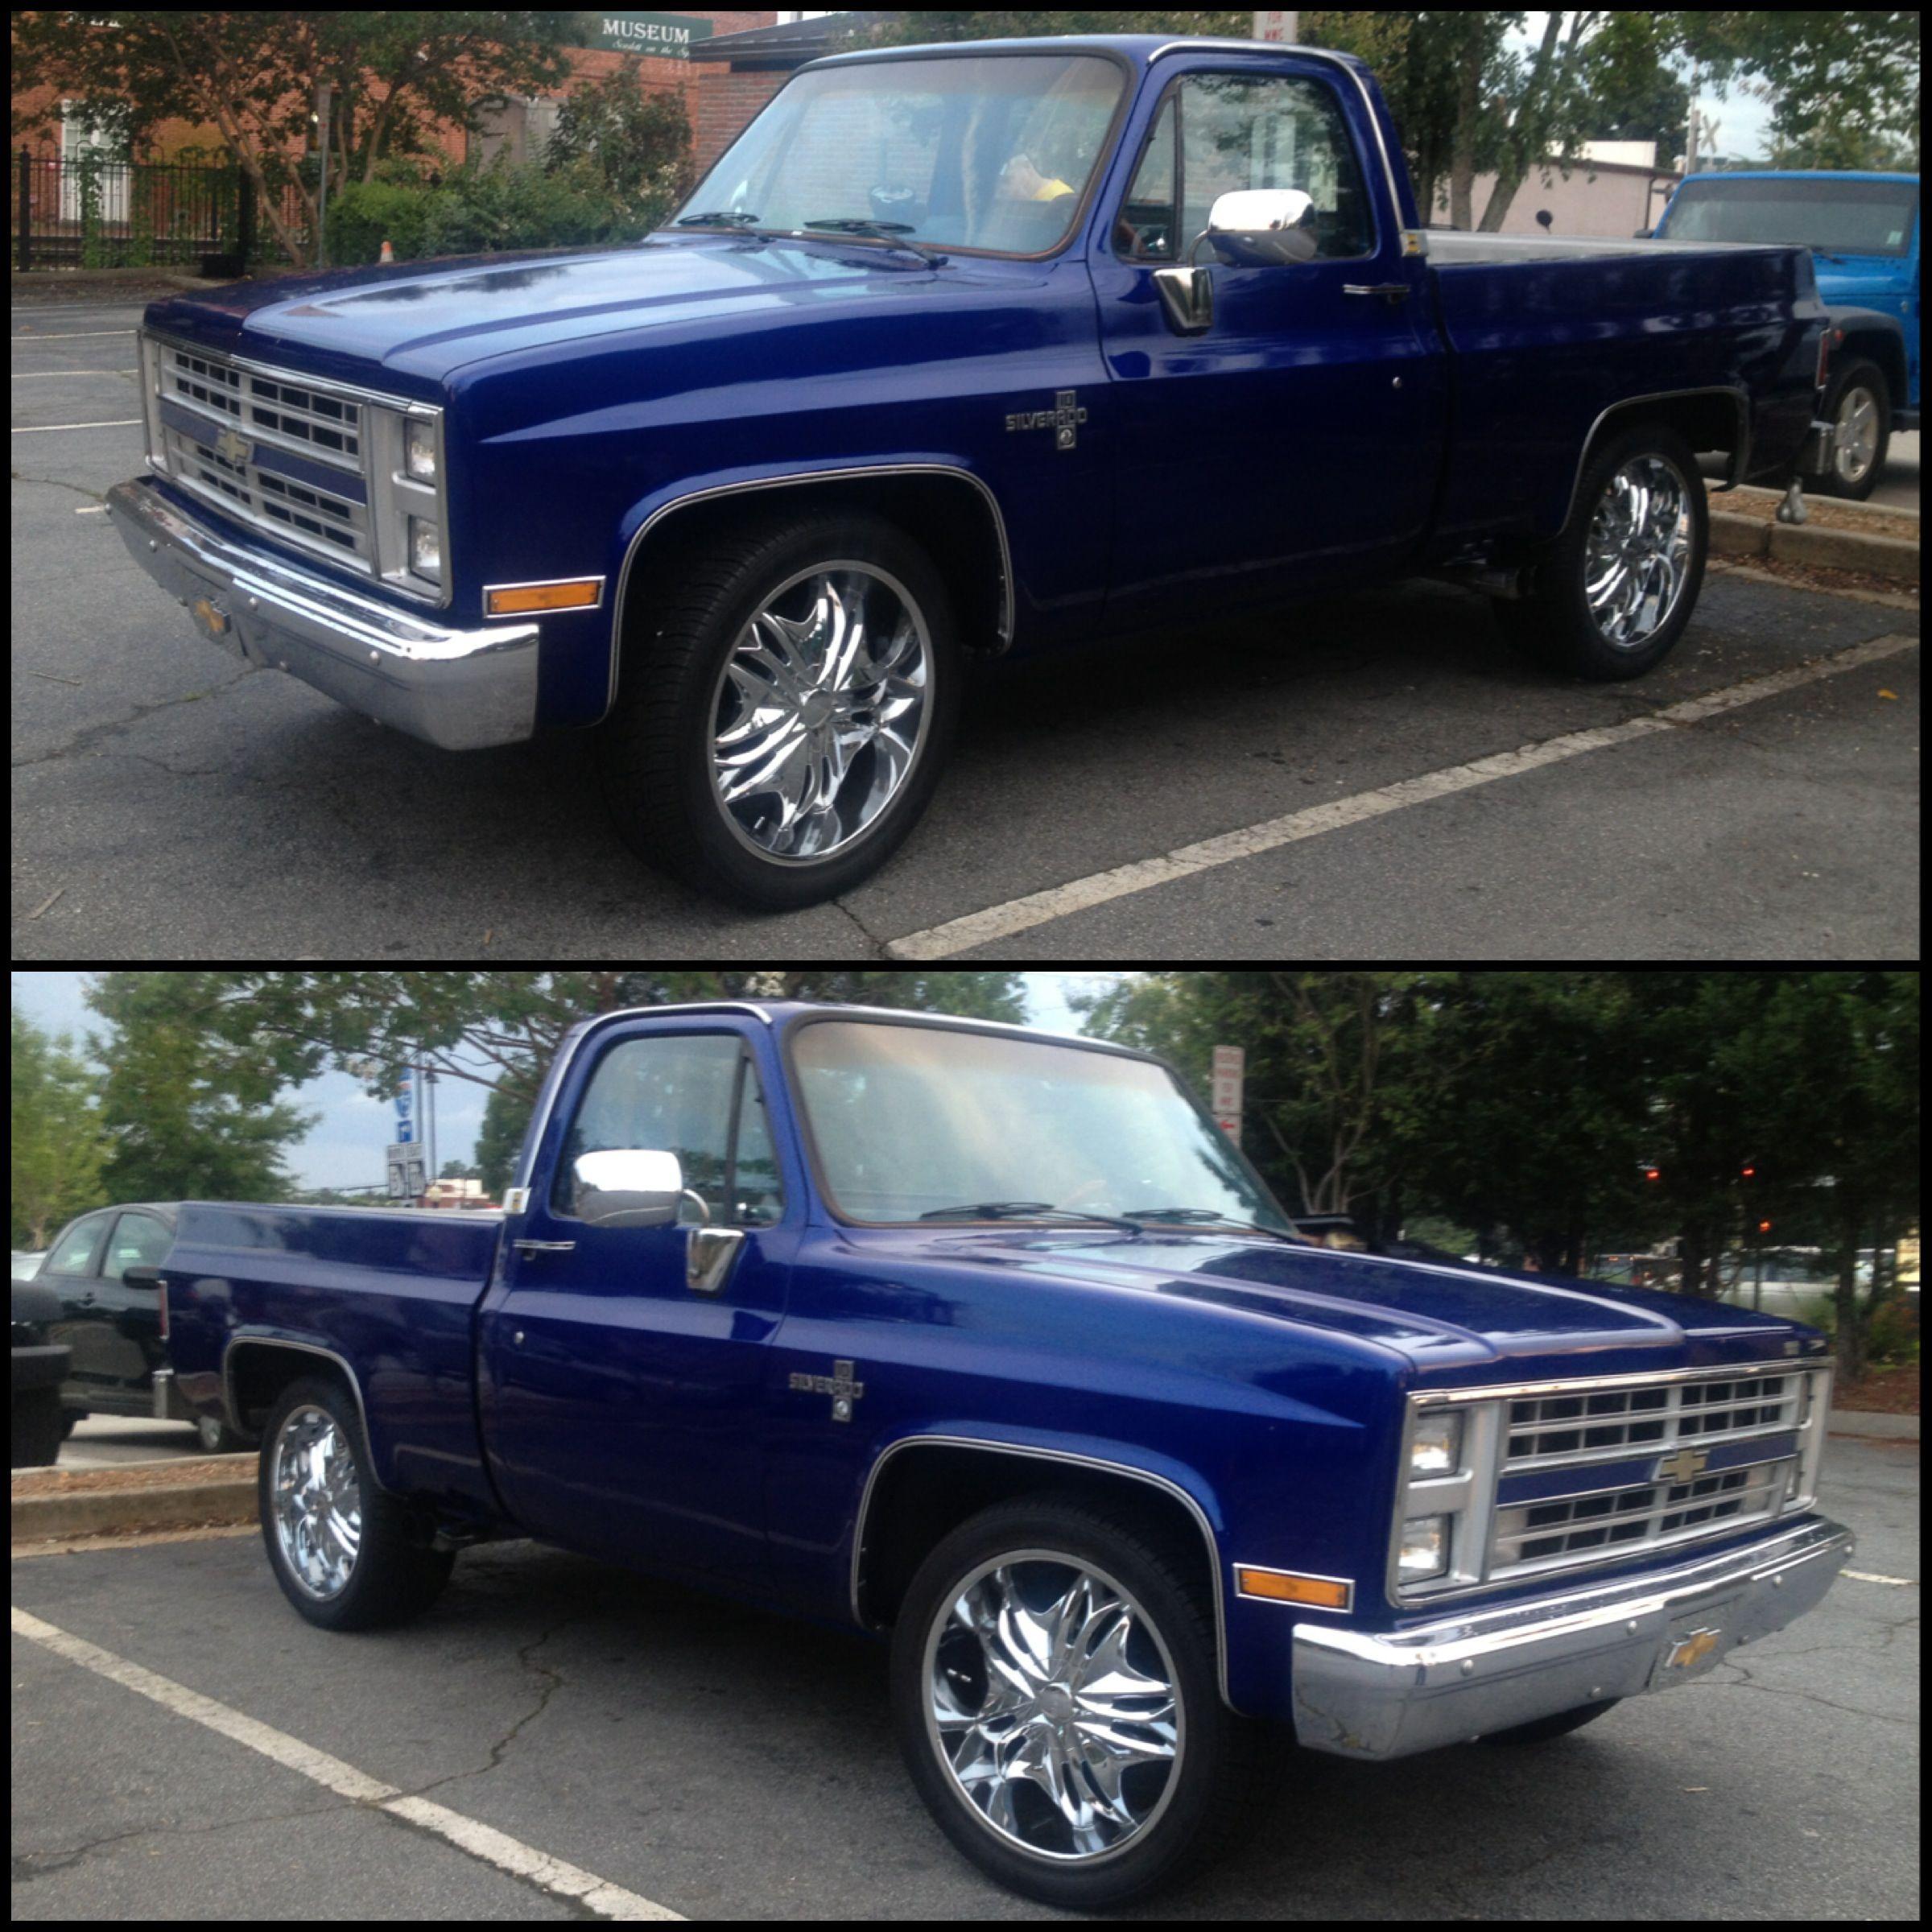 small resolution of 1981 chevy silverado blue over blue 350 350